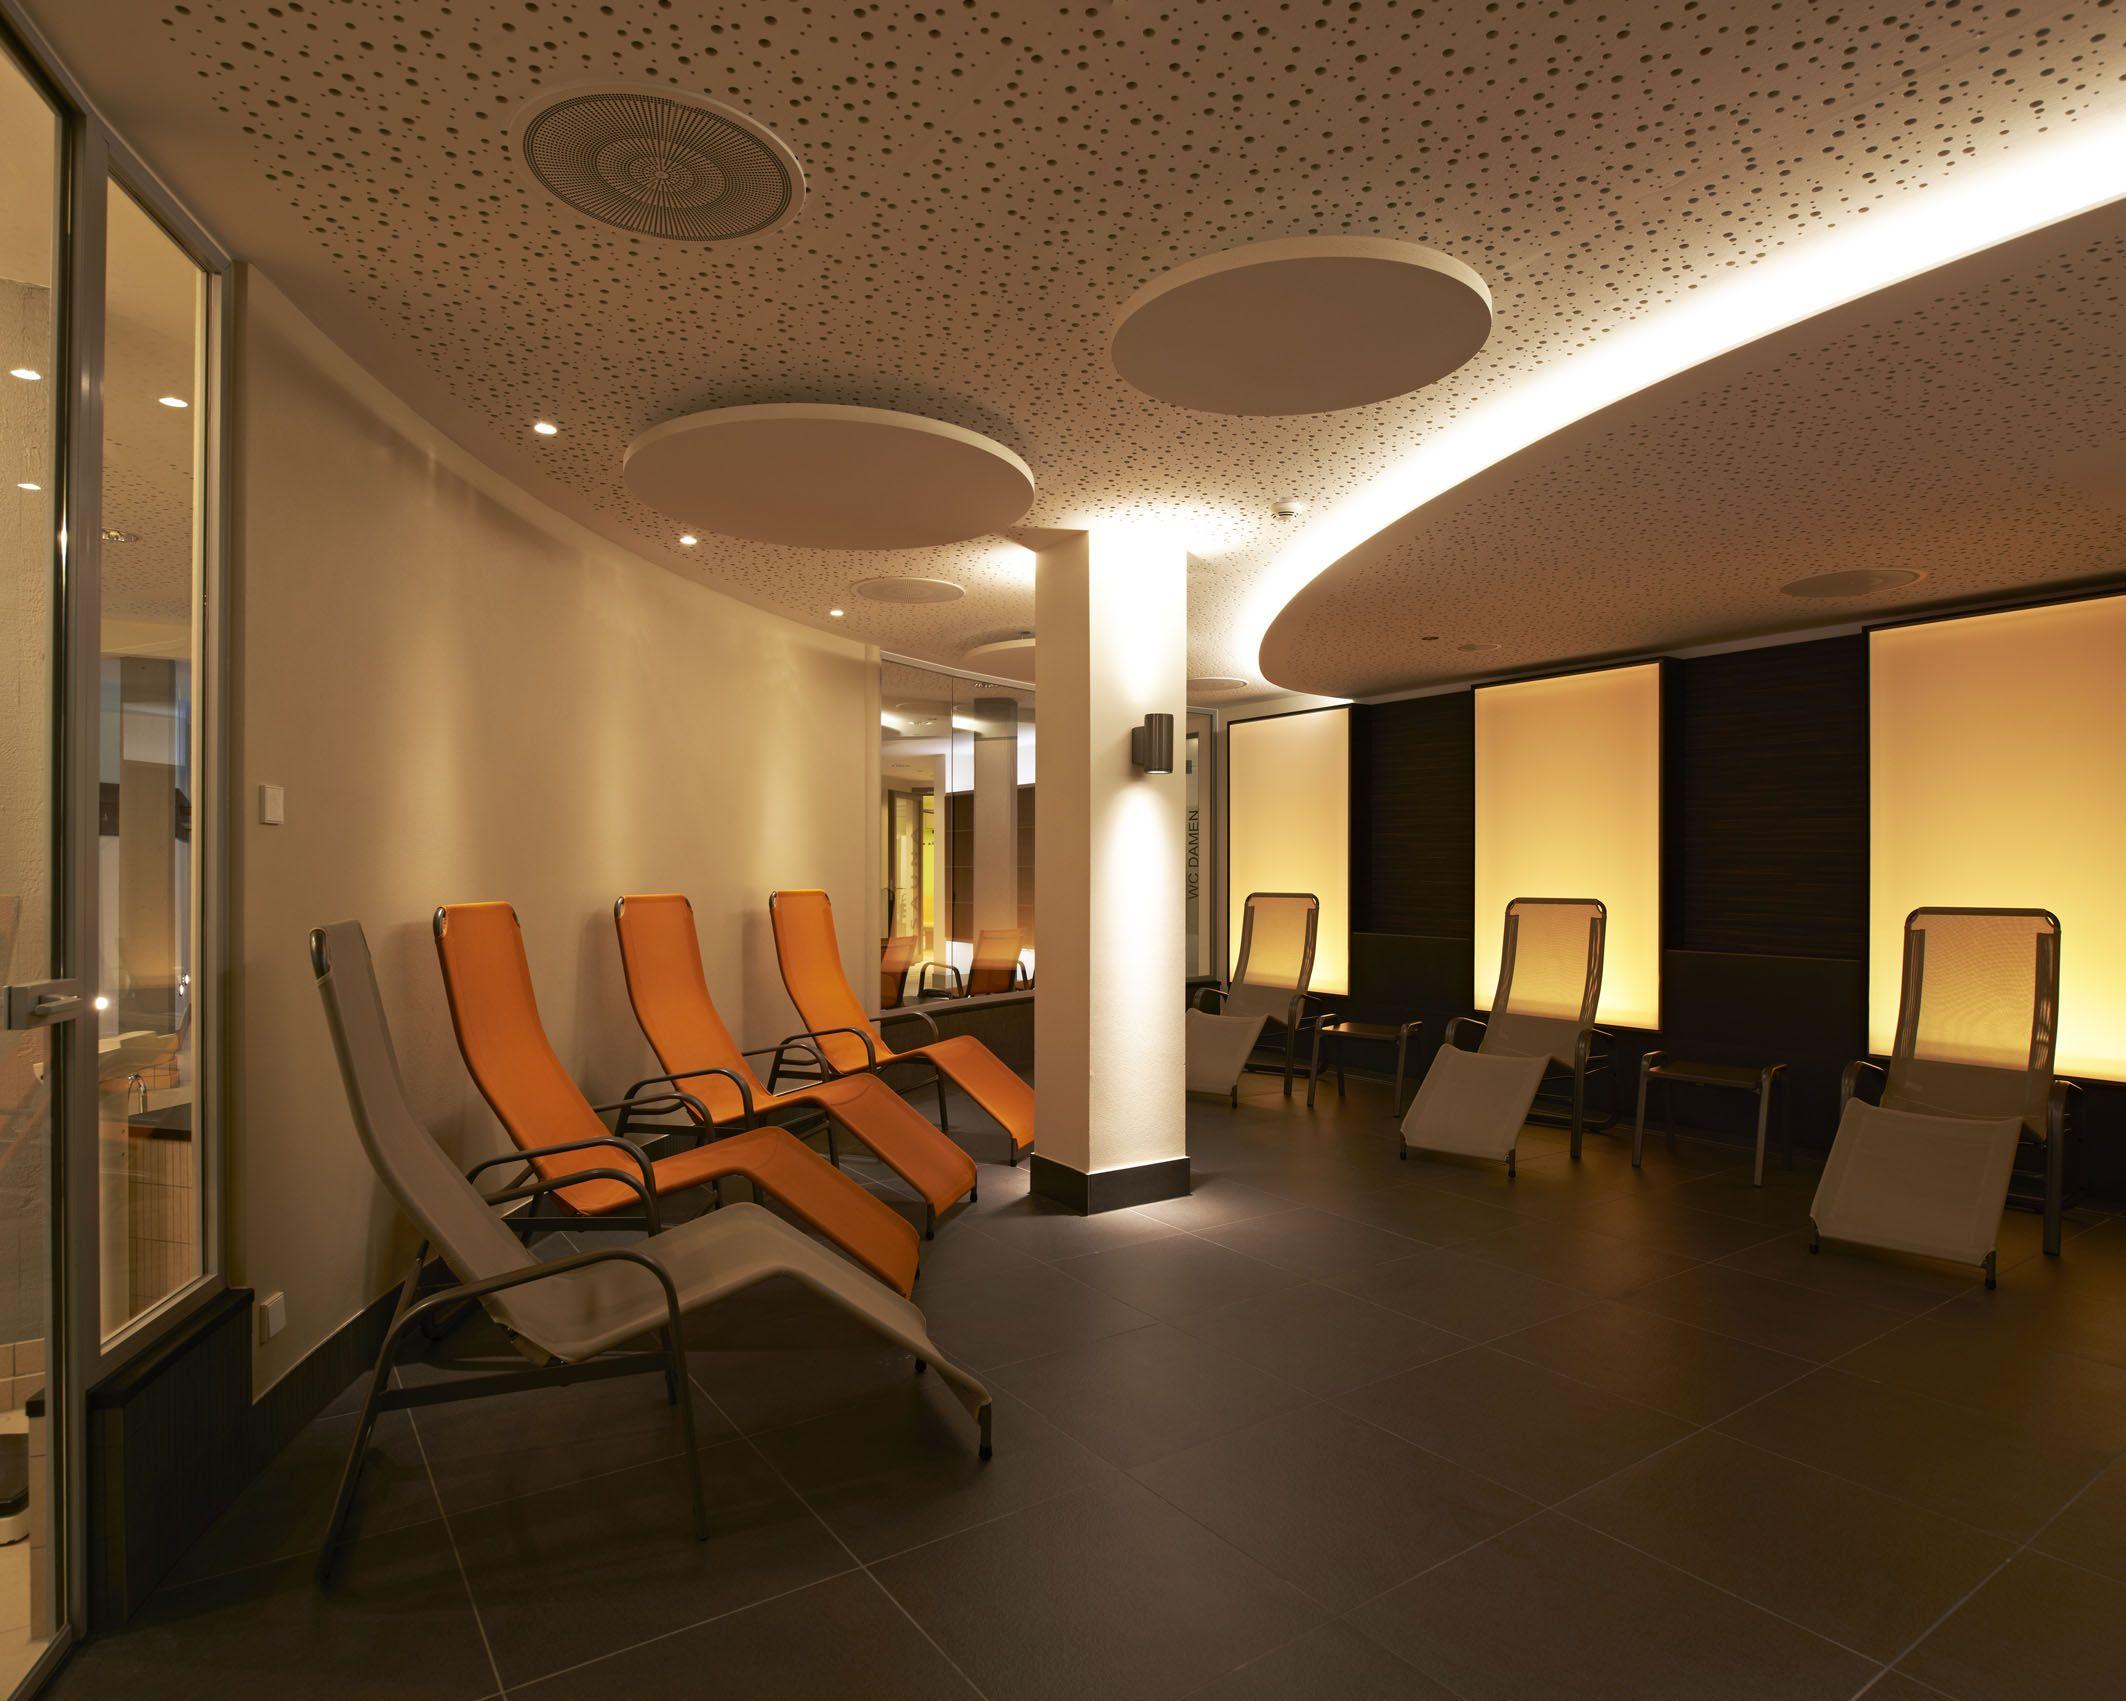 wellness center in ellwangen germany lighting products. Black Bedroom Furniture Sets. Home Design Ideas